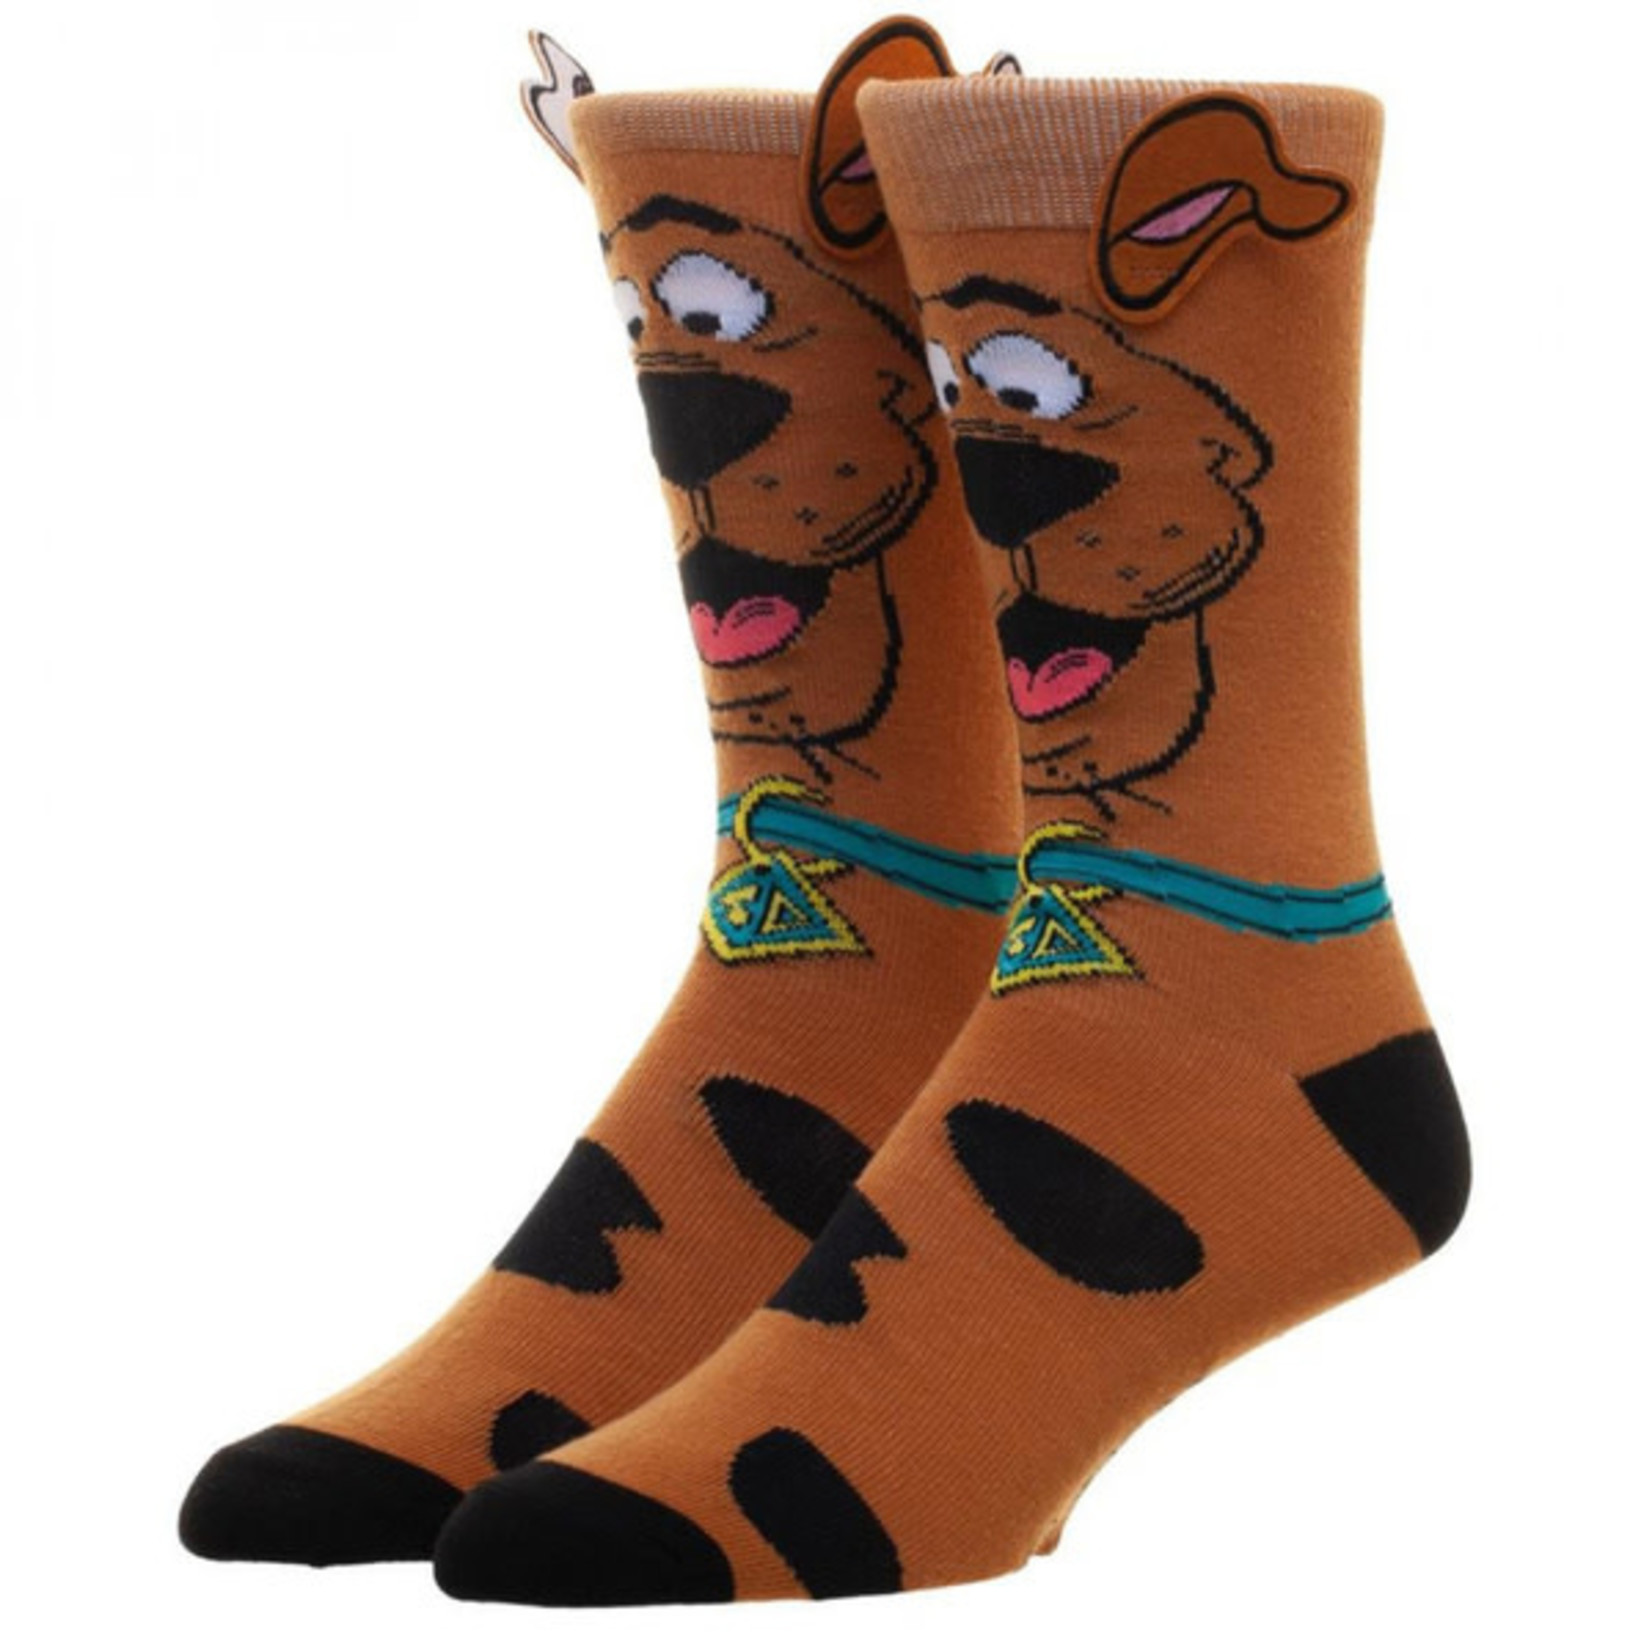 Socks (Mens) - Scooby Doo